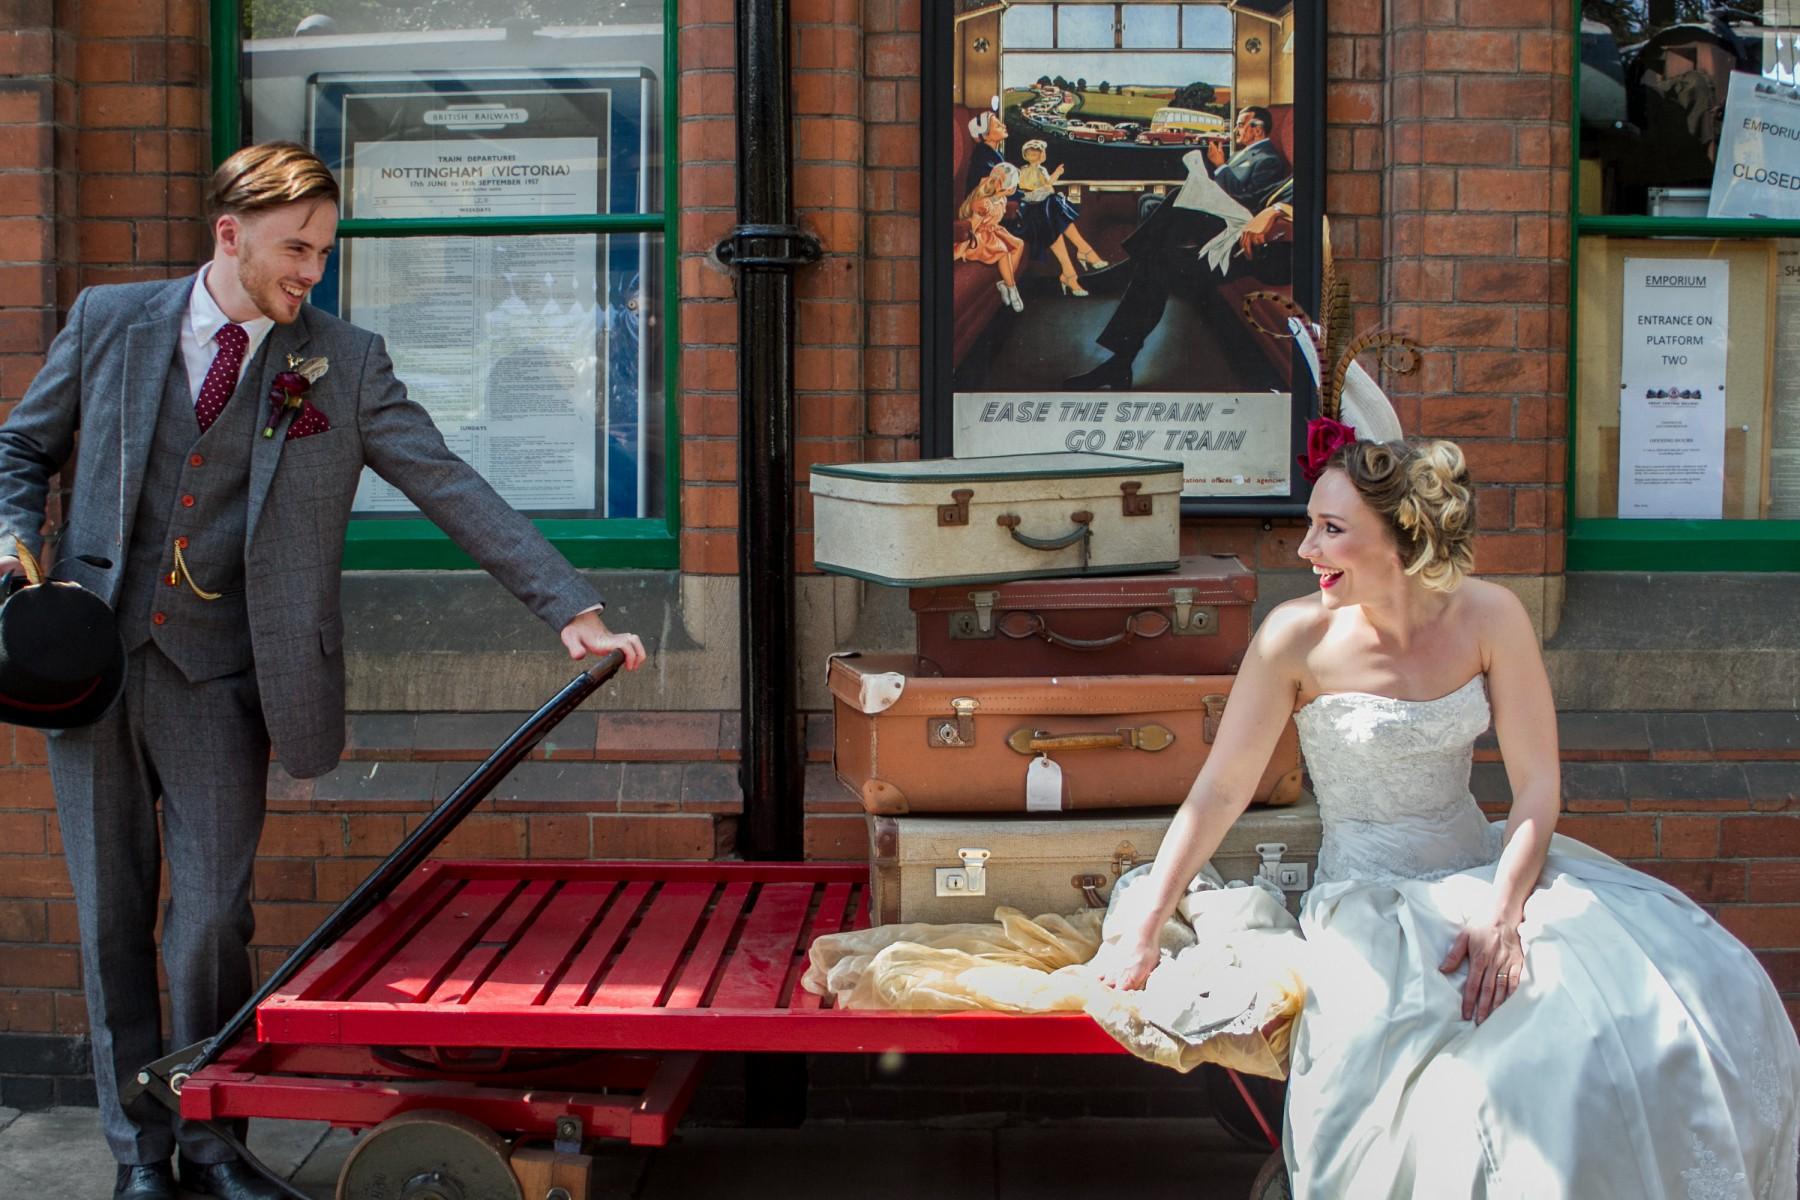 Iso Elegant Photography - Leicester wedding network - Railway wedding - vintage wedding 39